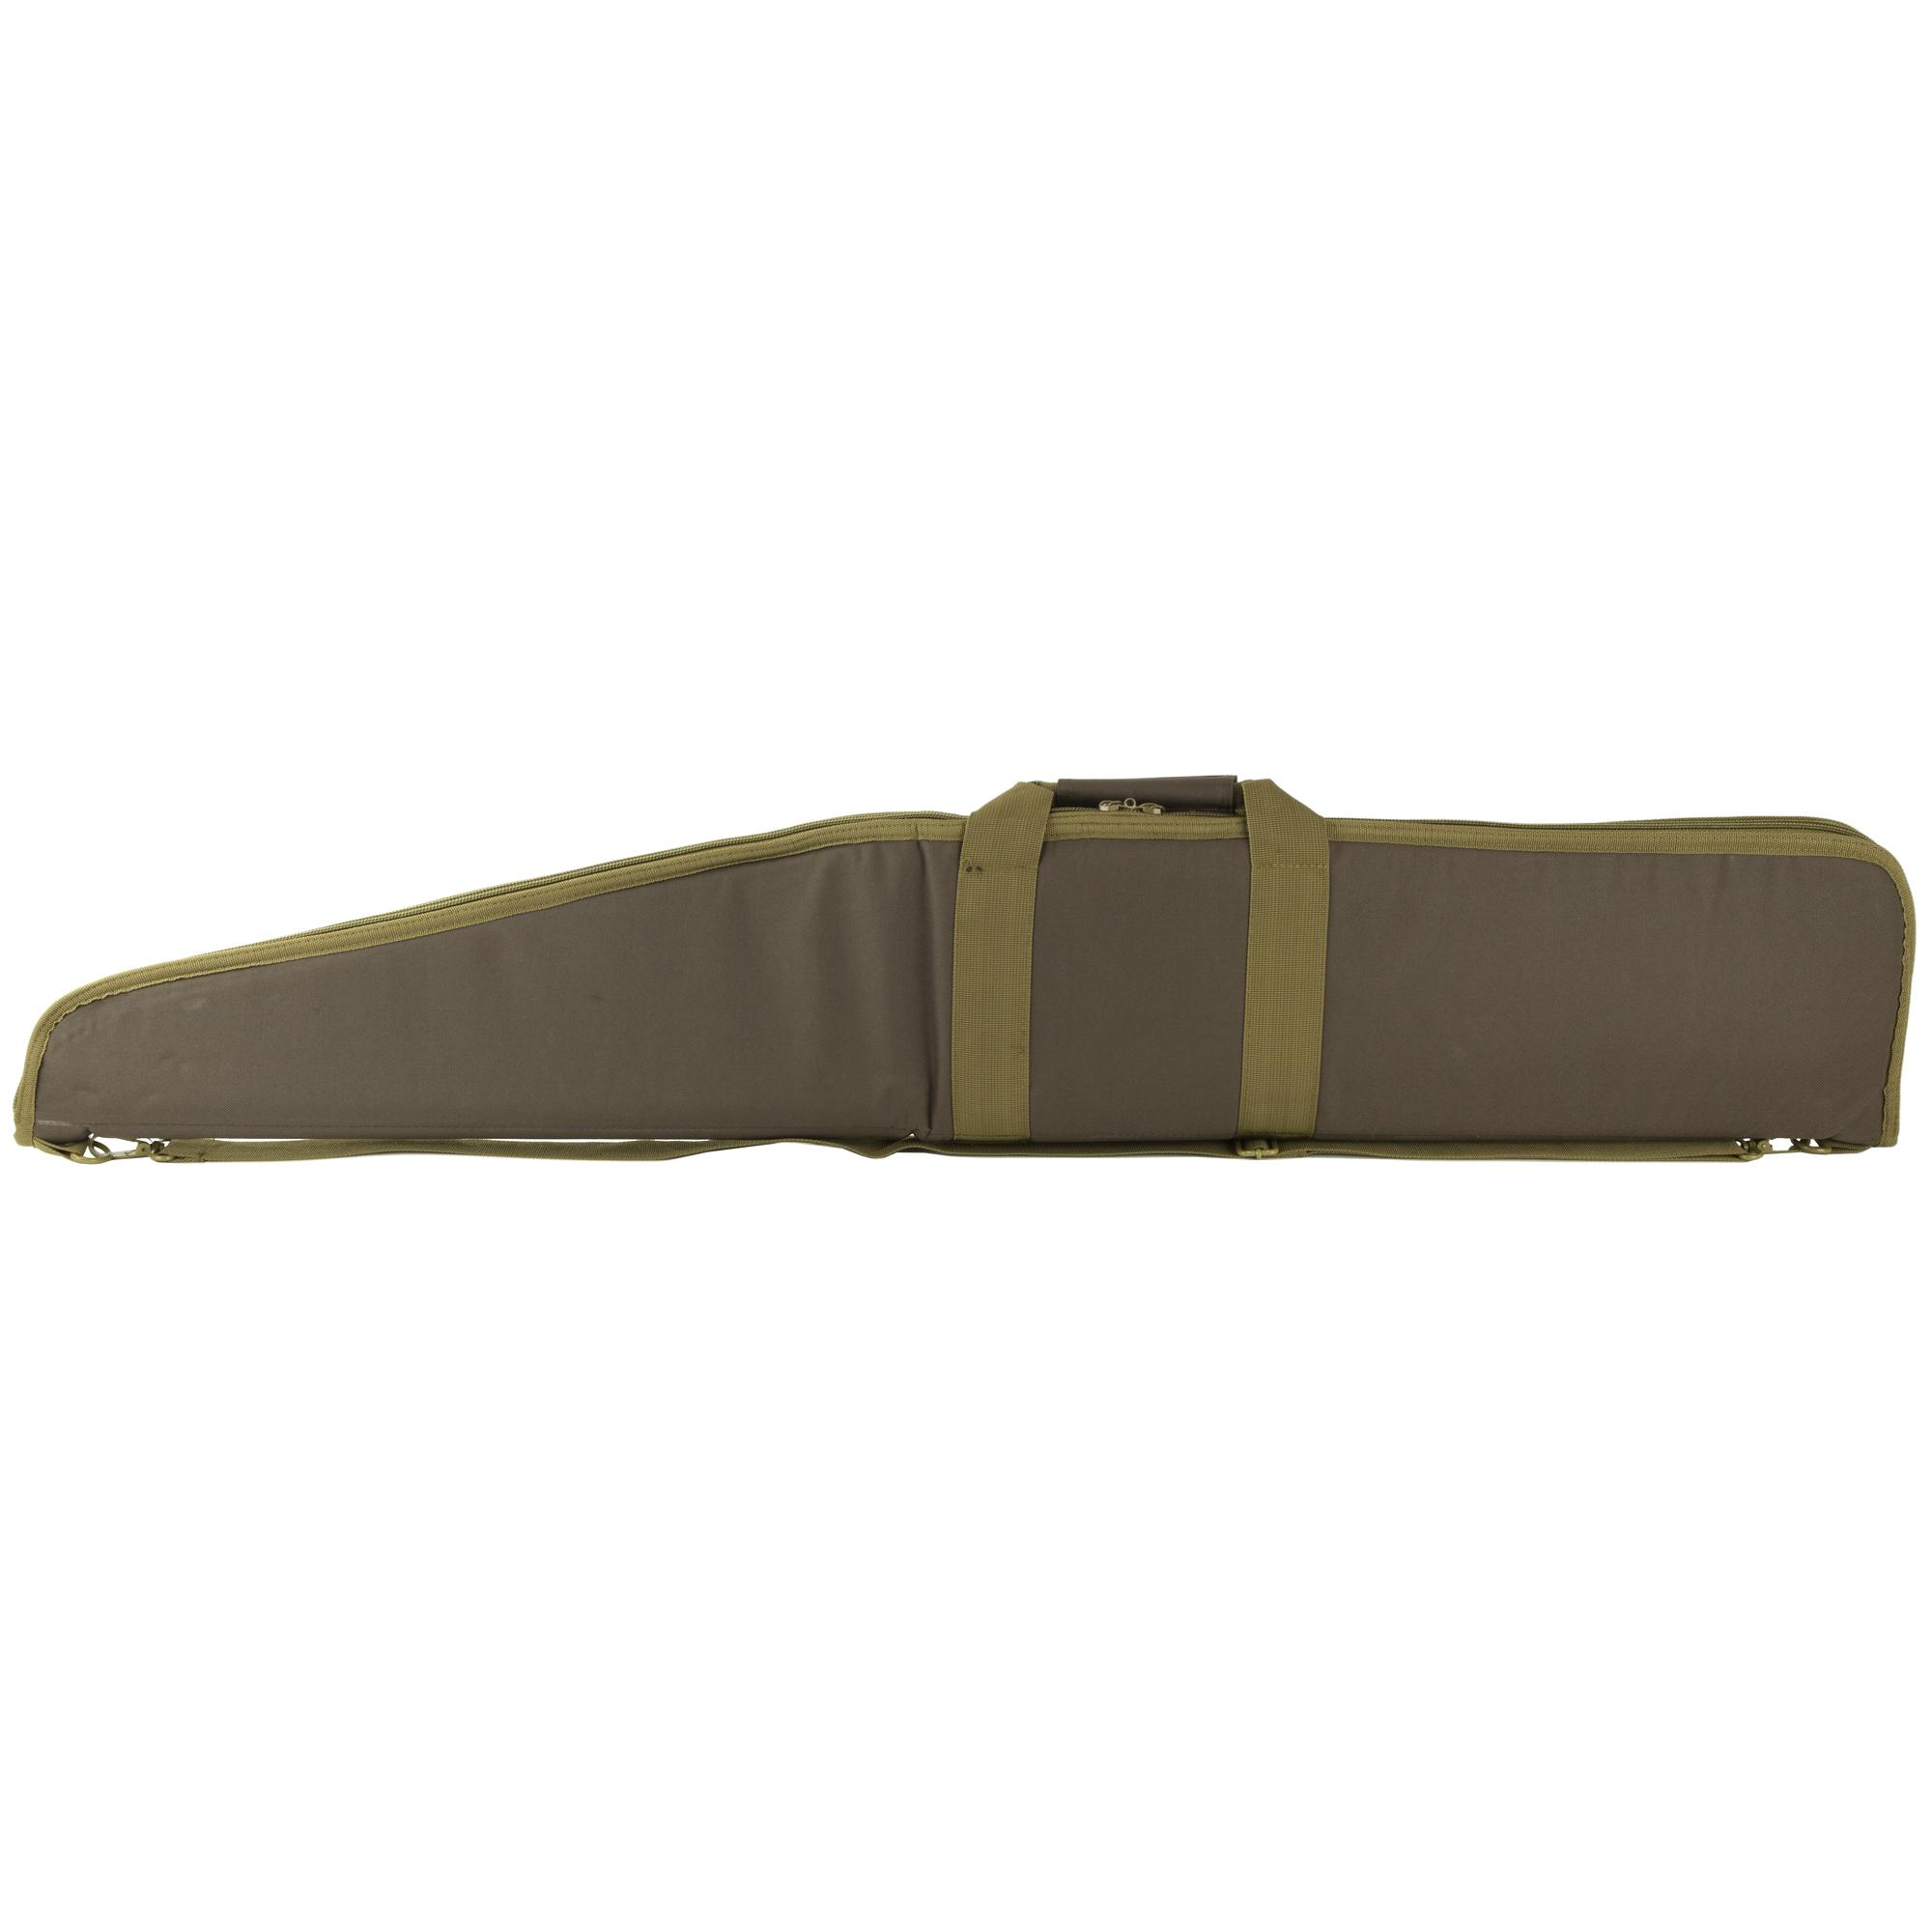 NCSTAR 2958 Series Shotgun Case Nylon 48″ – Brown